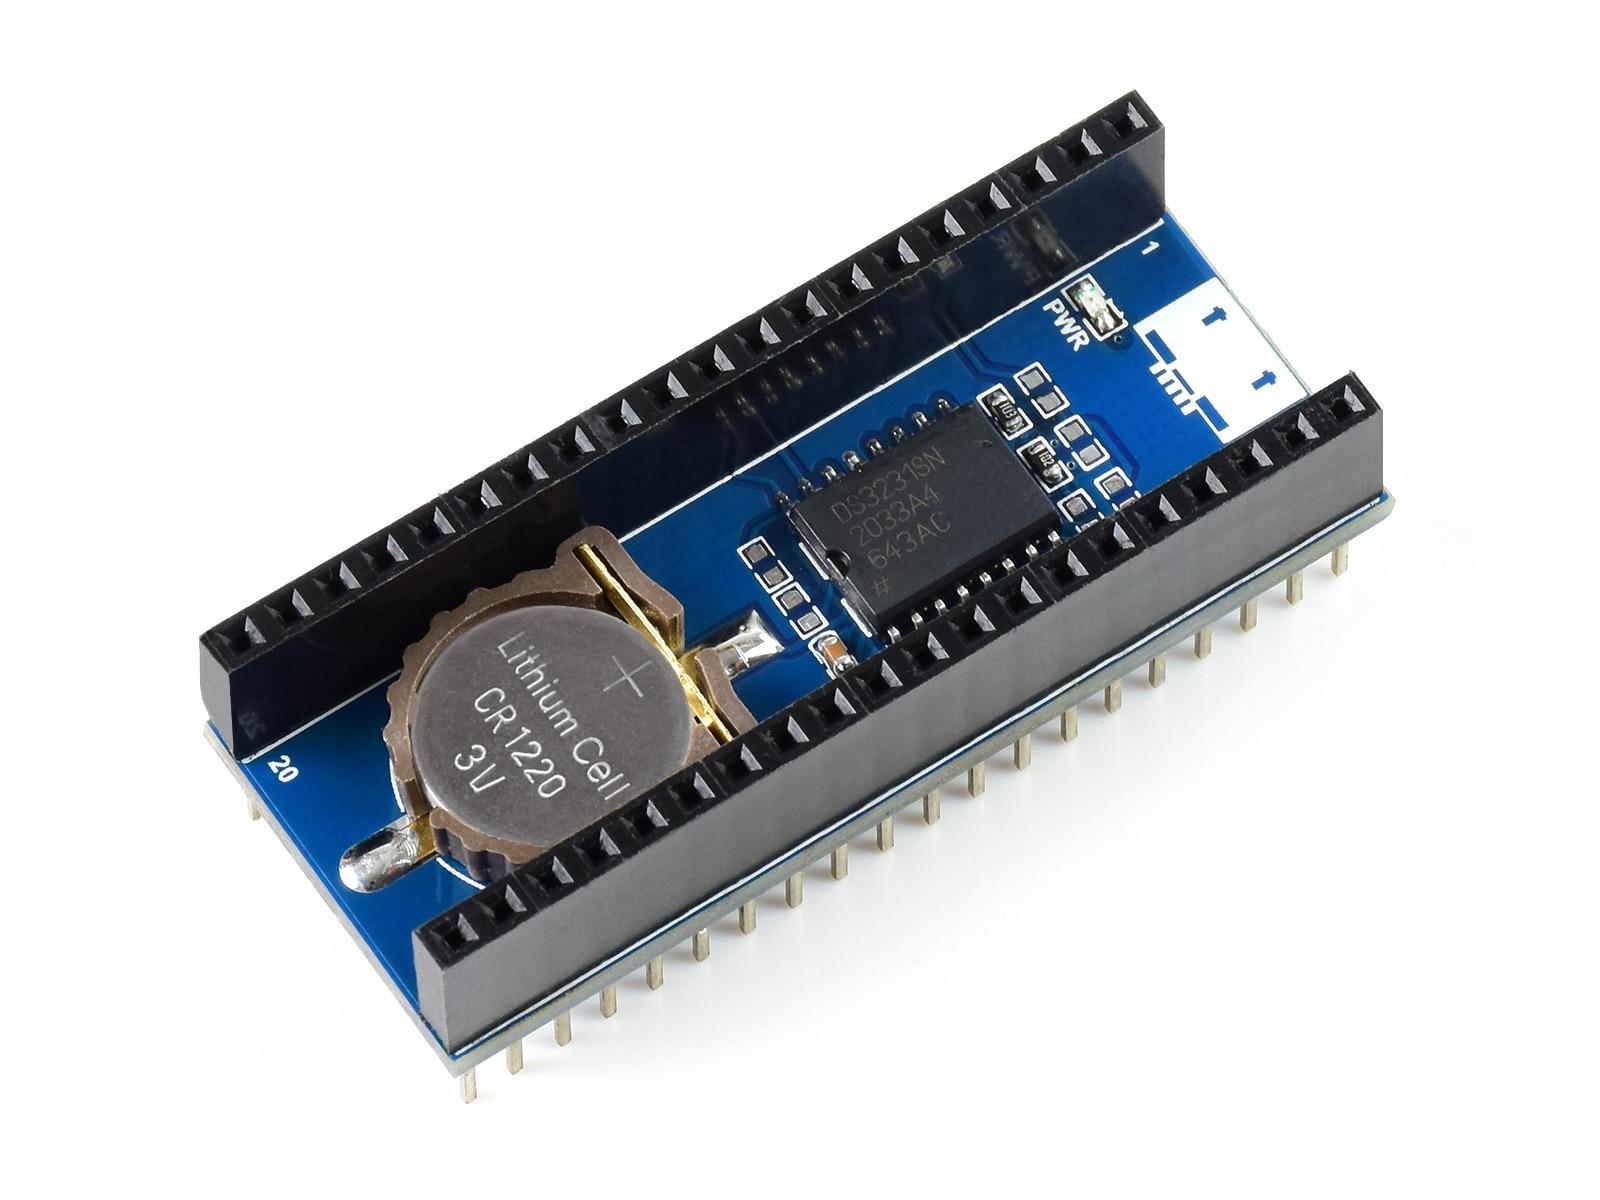 Модуль Waveshare Precision RTC для Raspberry Pi Pico, встроенный чип DS3231